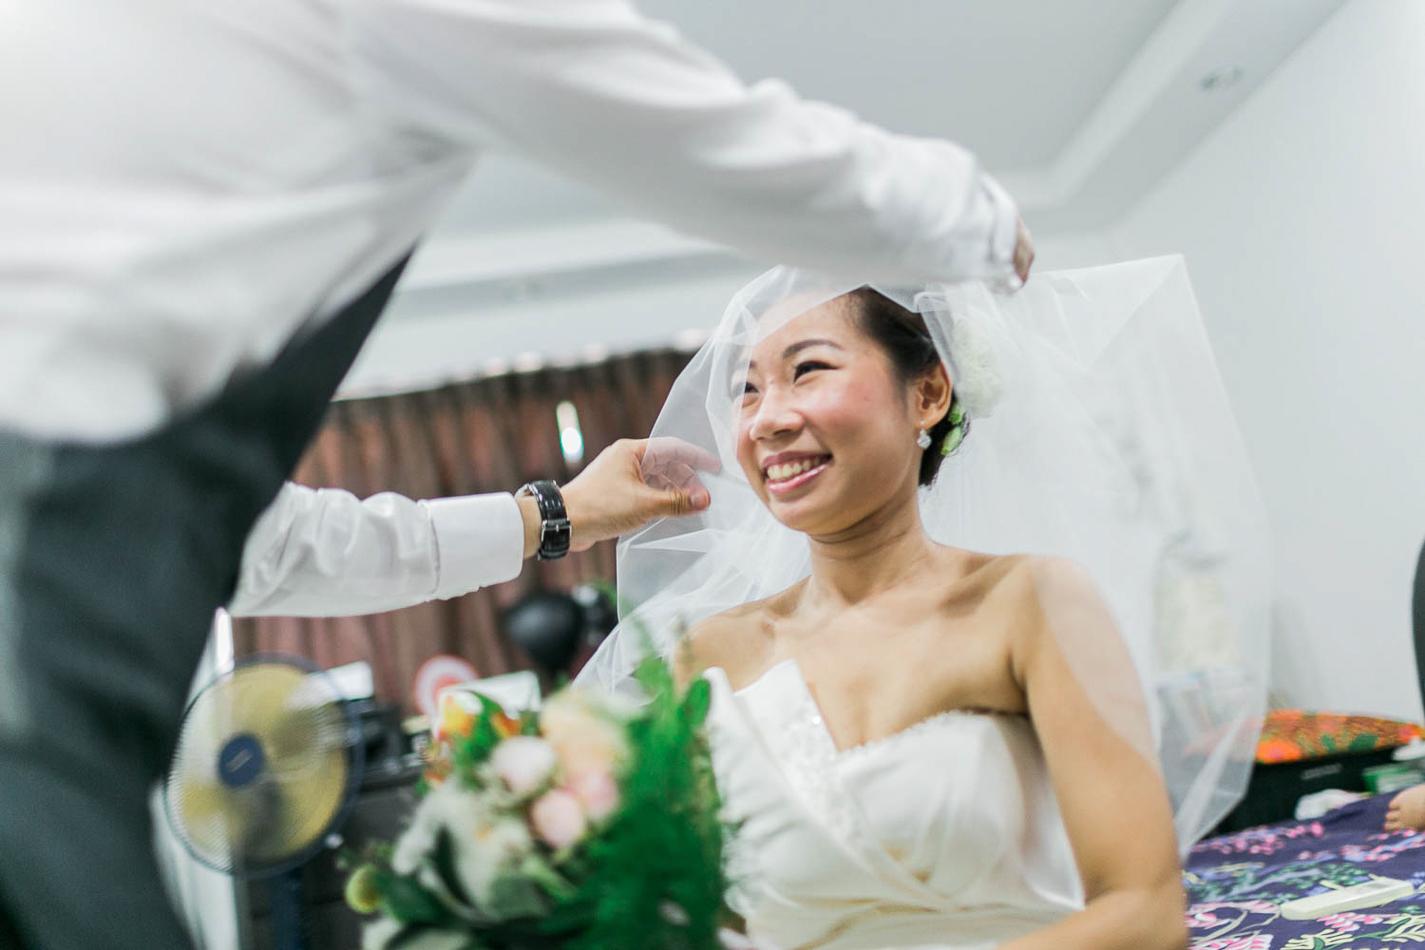 wedding-photographer-singapore-film-photographer-chen-sands-MinKang-wedding-CSPBLOG-21.jpg